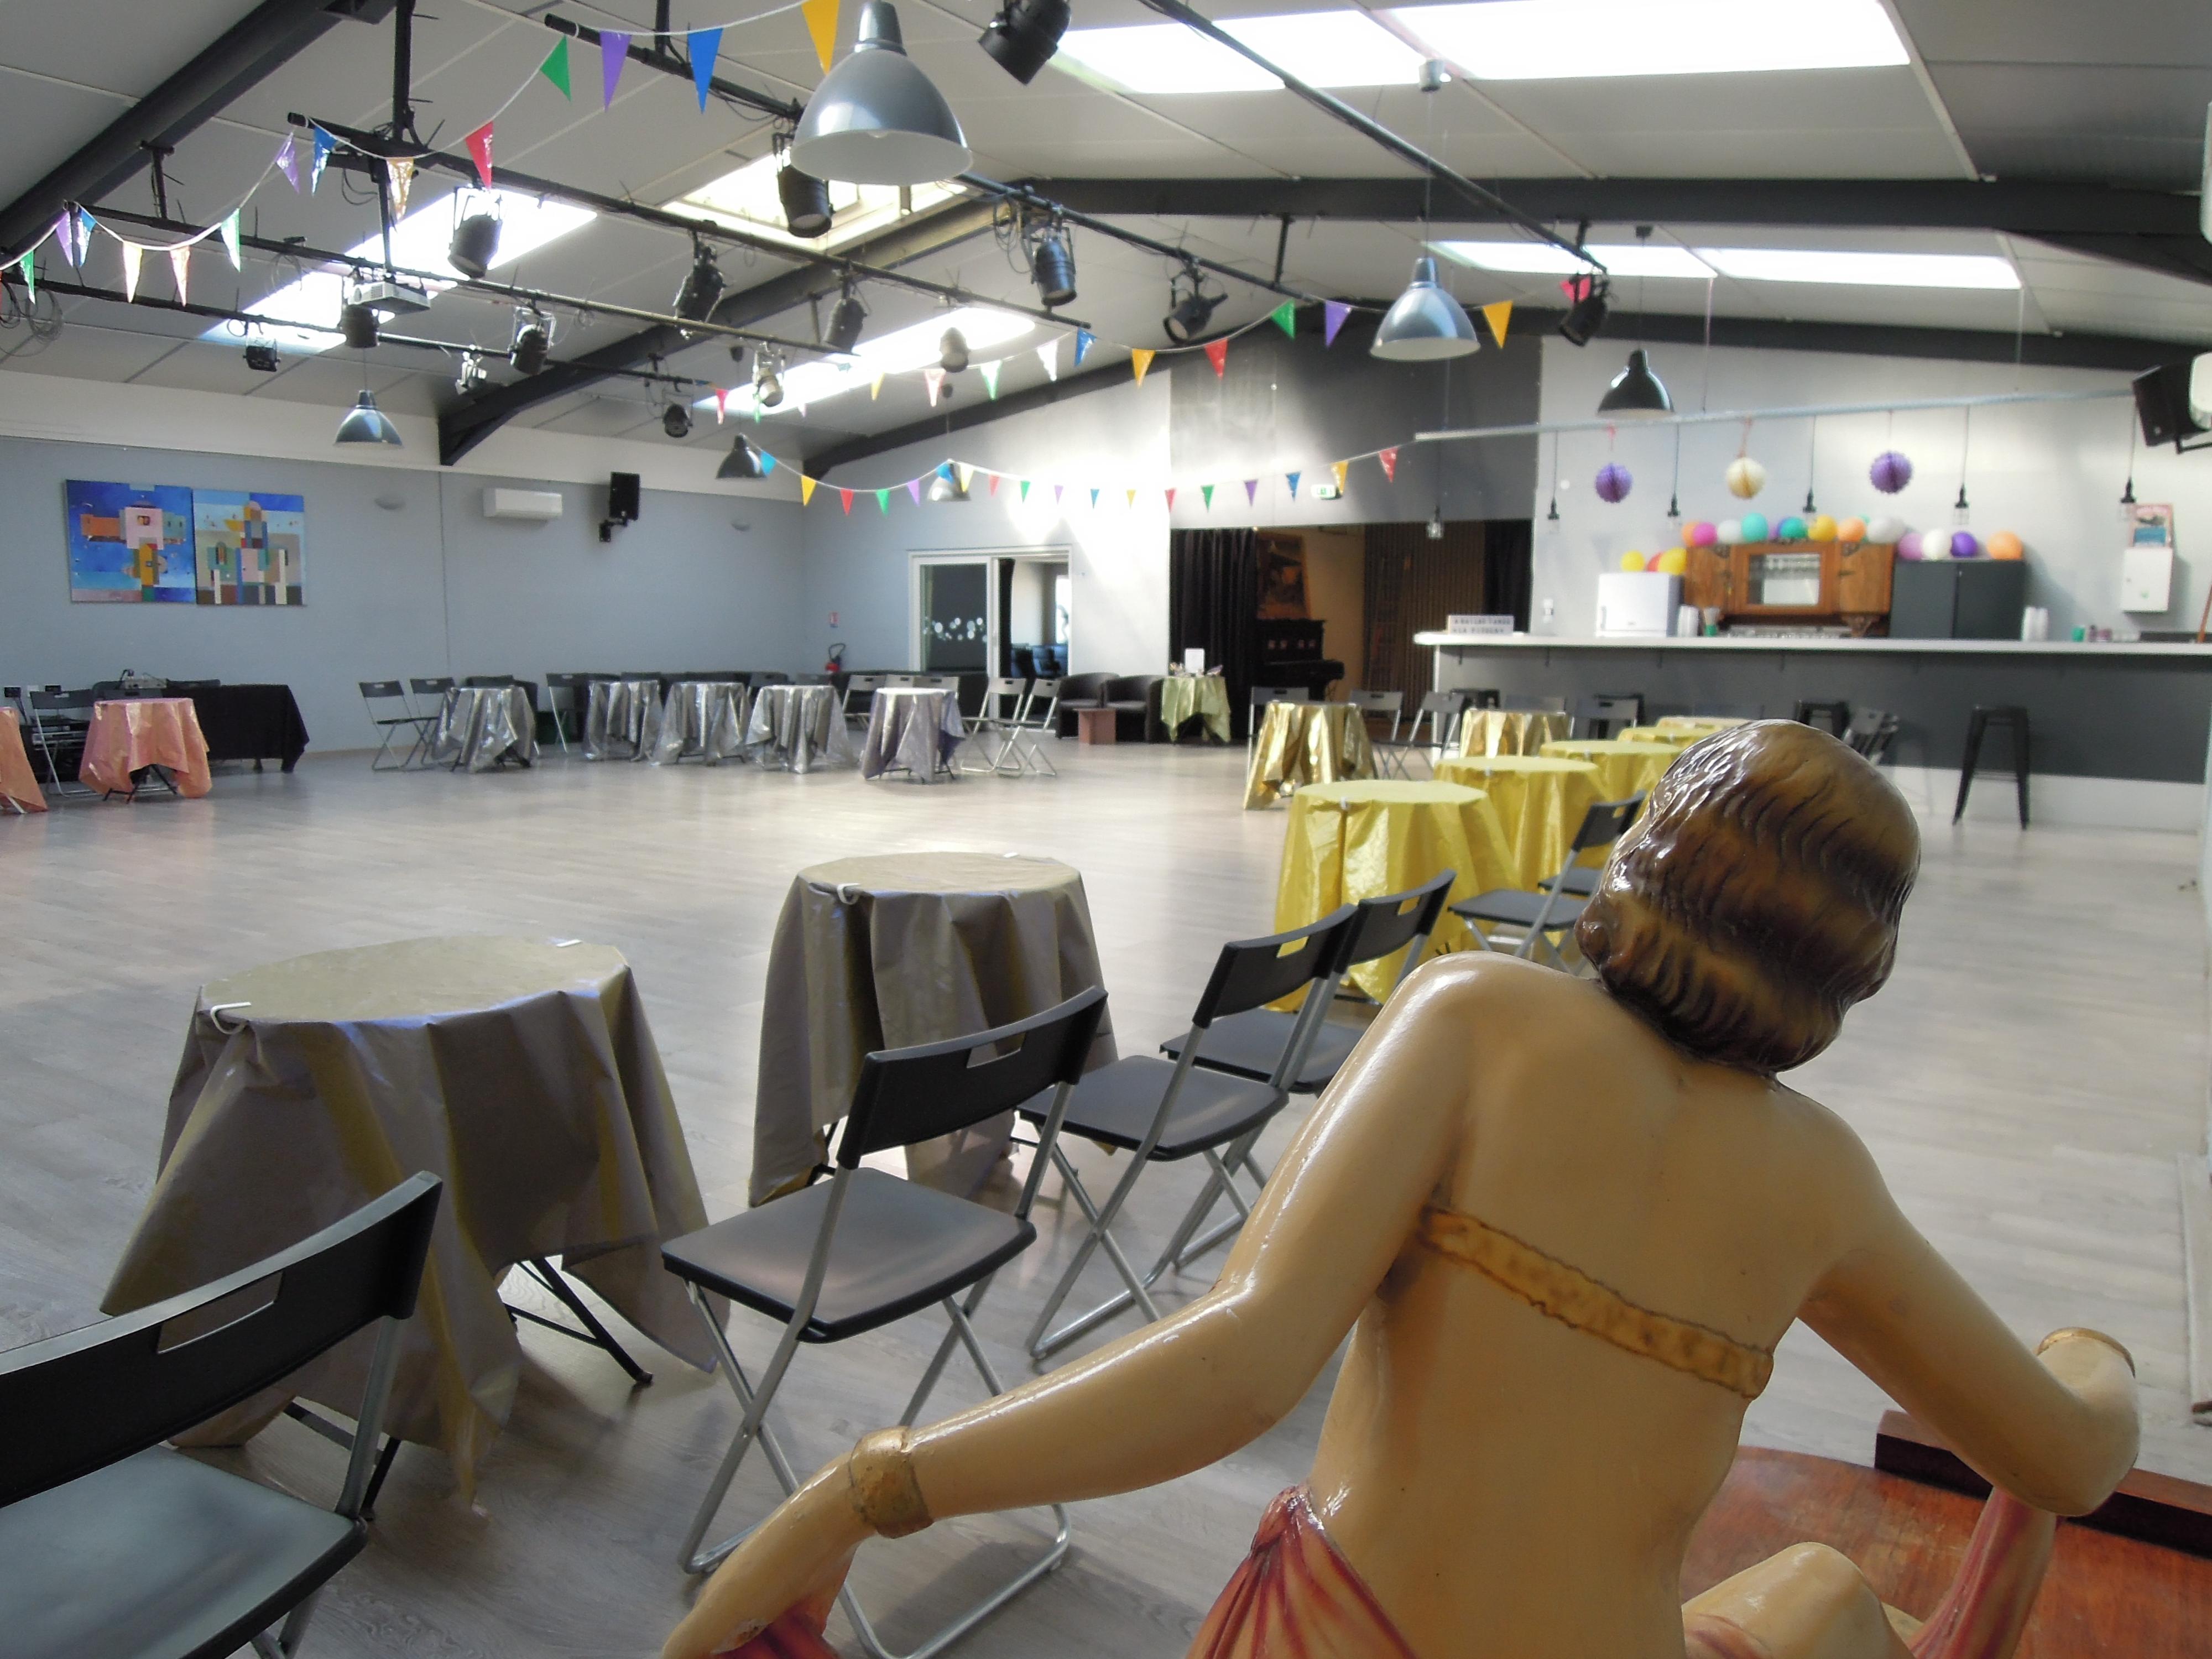 Dscn6559 el sal n de tango rufino luro cambaceres location salle de danse montpellier - Danse de salon montpellier ...